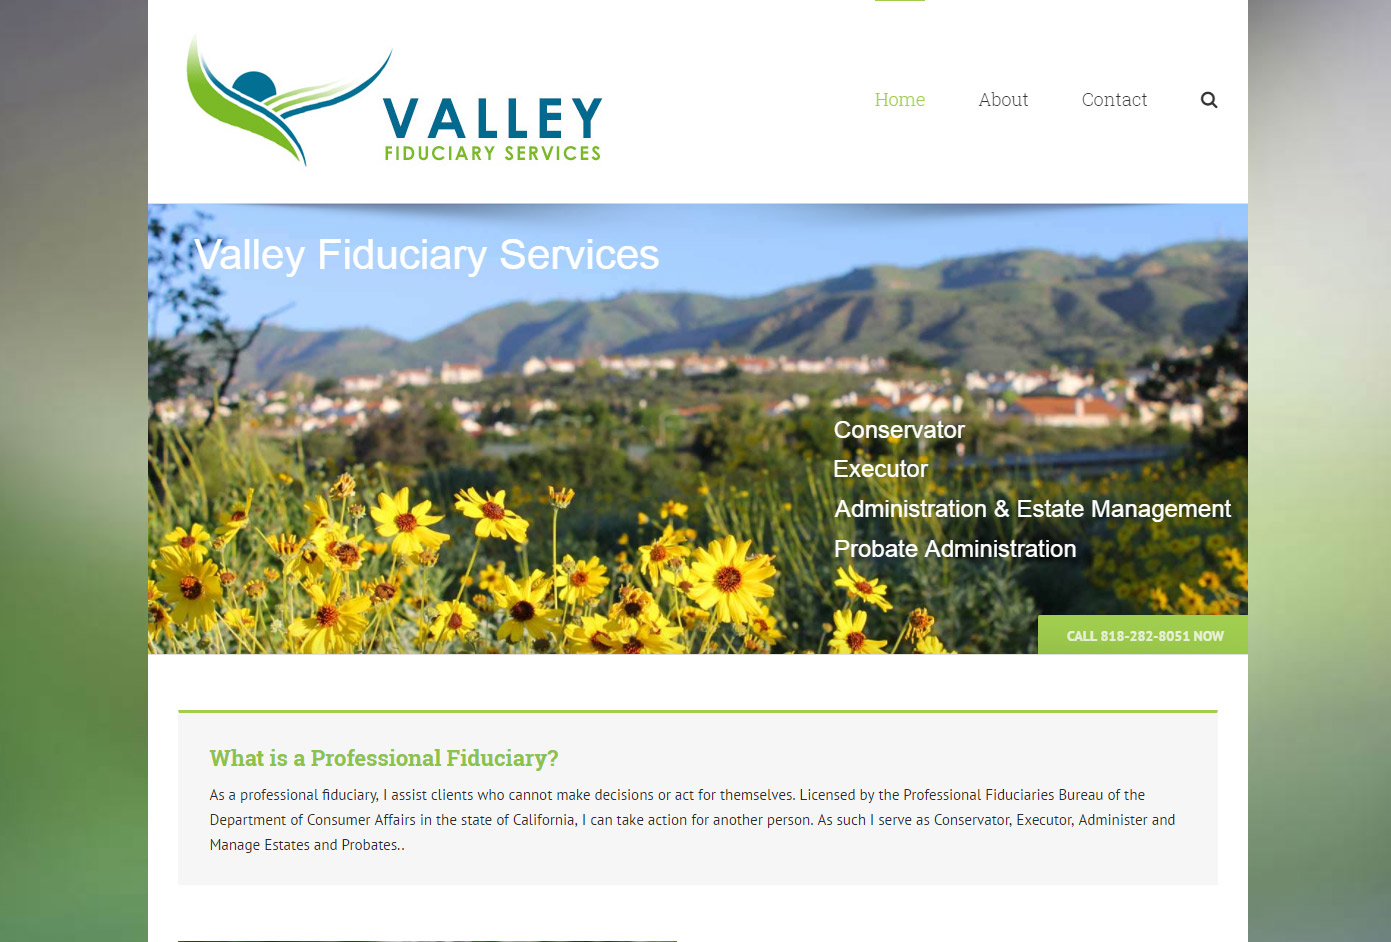 Valley Fiduciary